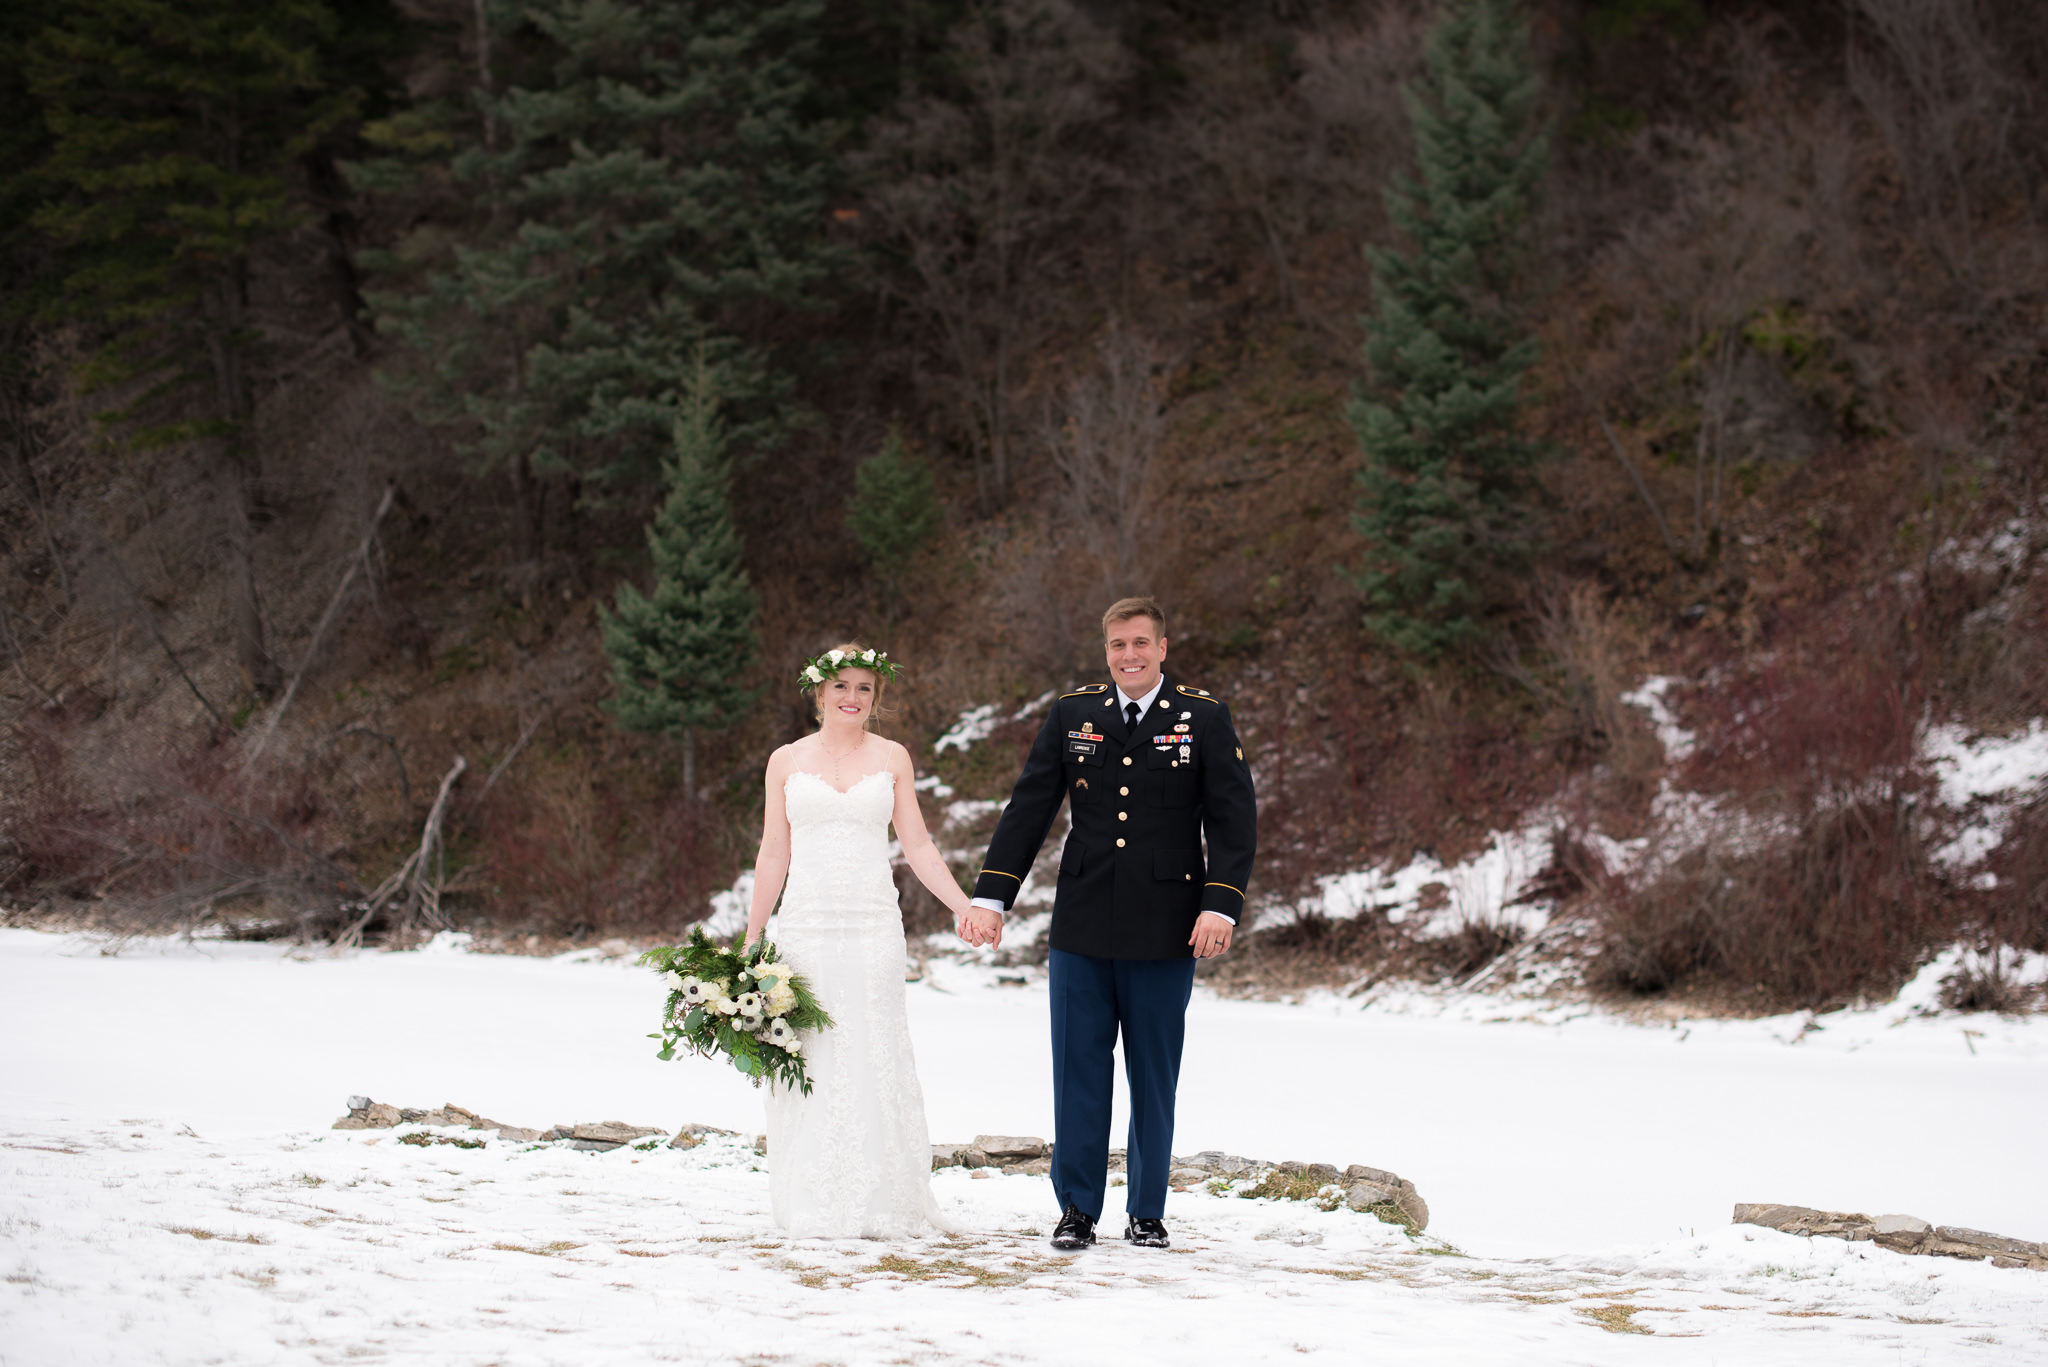 Trevor-Hooper-Wedding-Photographer-The-Bungalow-Wedding-Utah_CLR_007.jpg